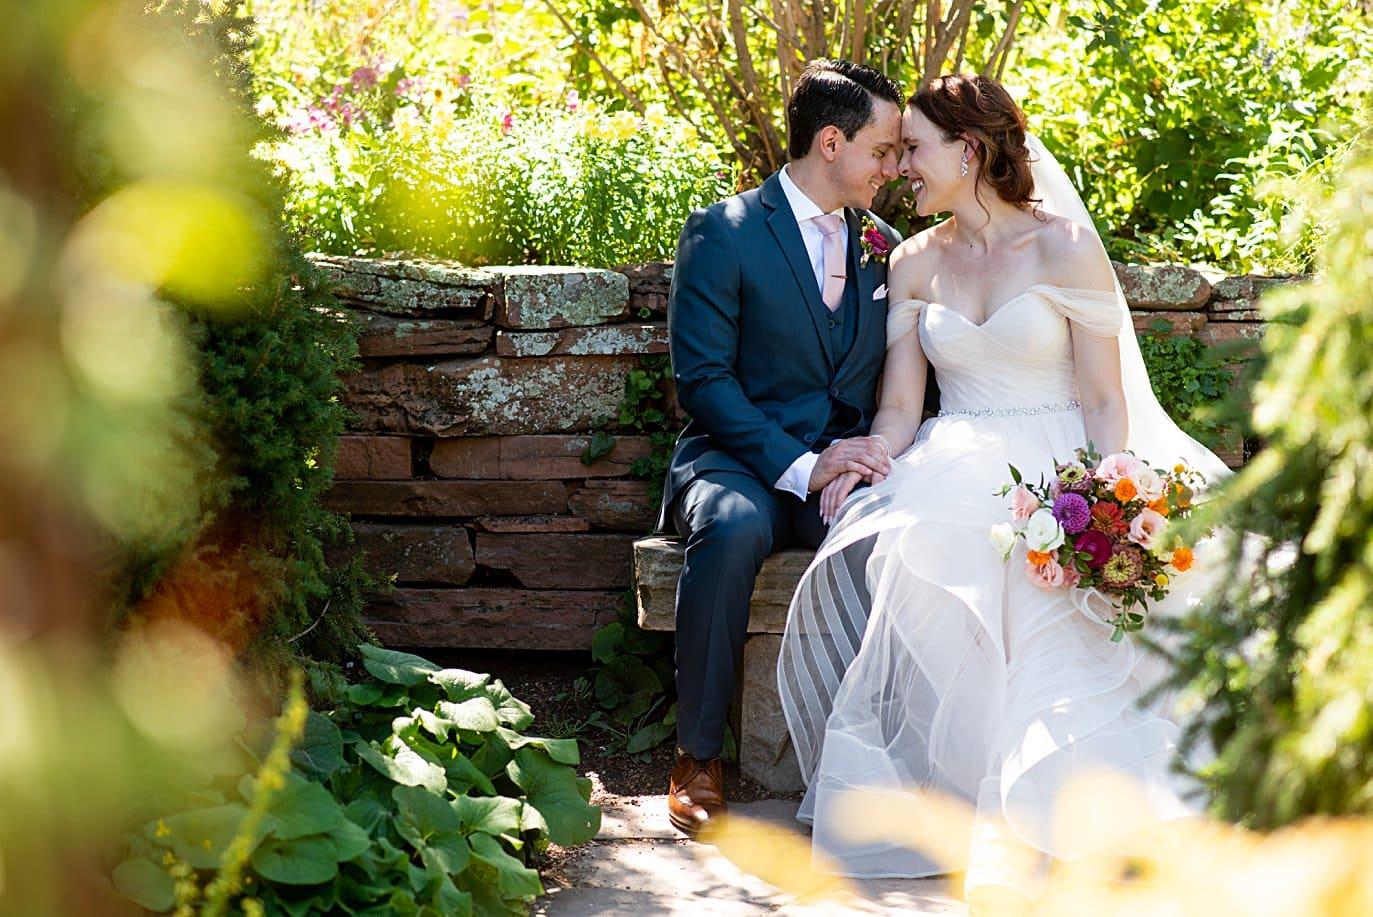 bride and groom find hidden stone bench at Denver Botanic Gardens microwedding by Boulder wedding photographer Jennie Crate